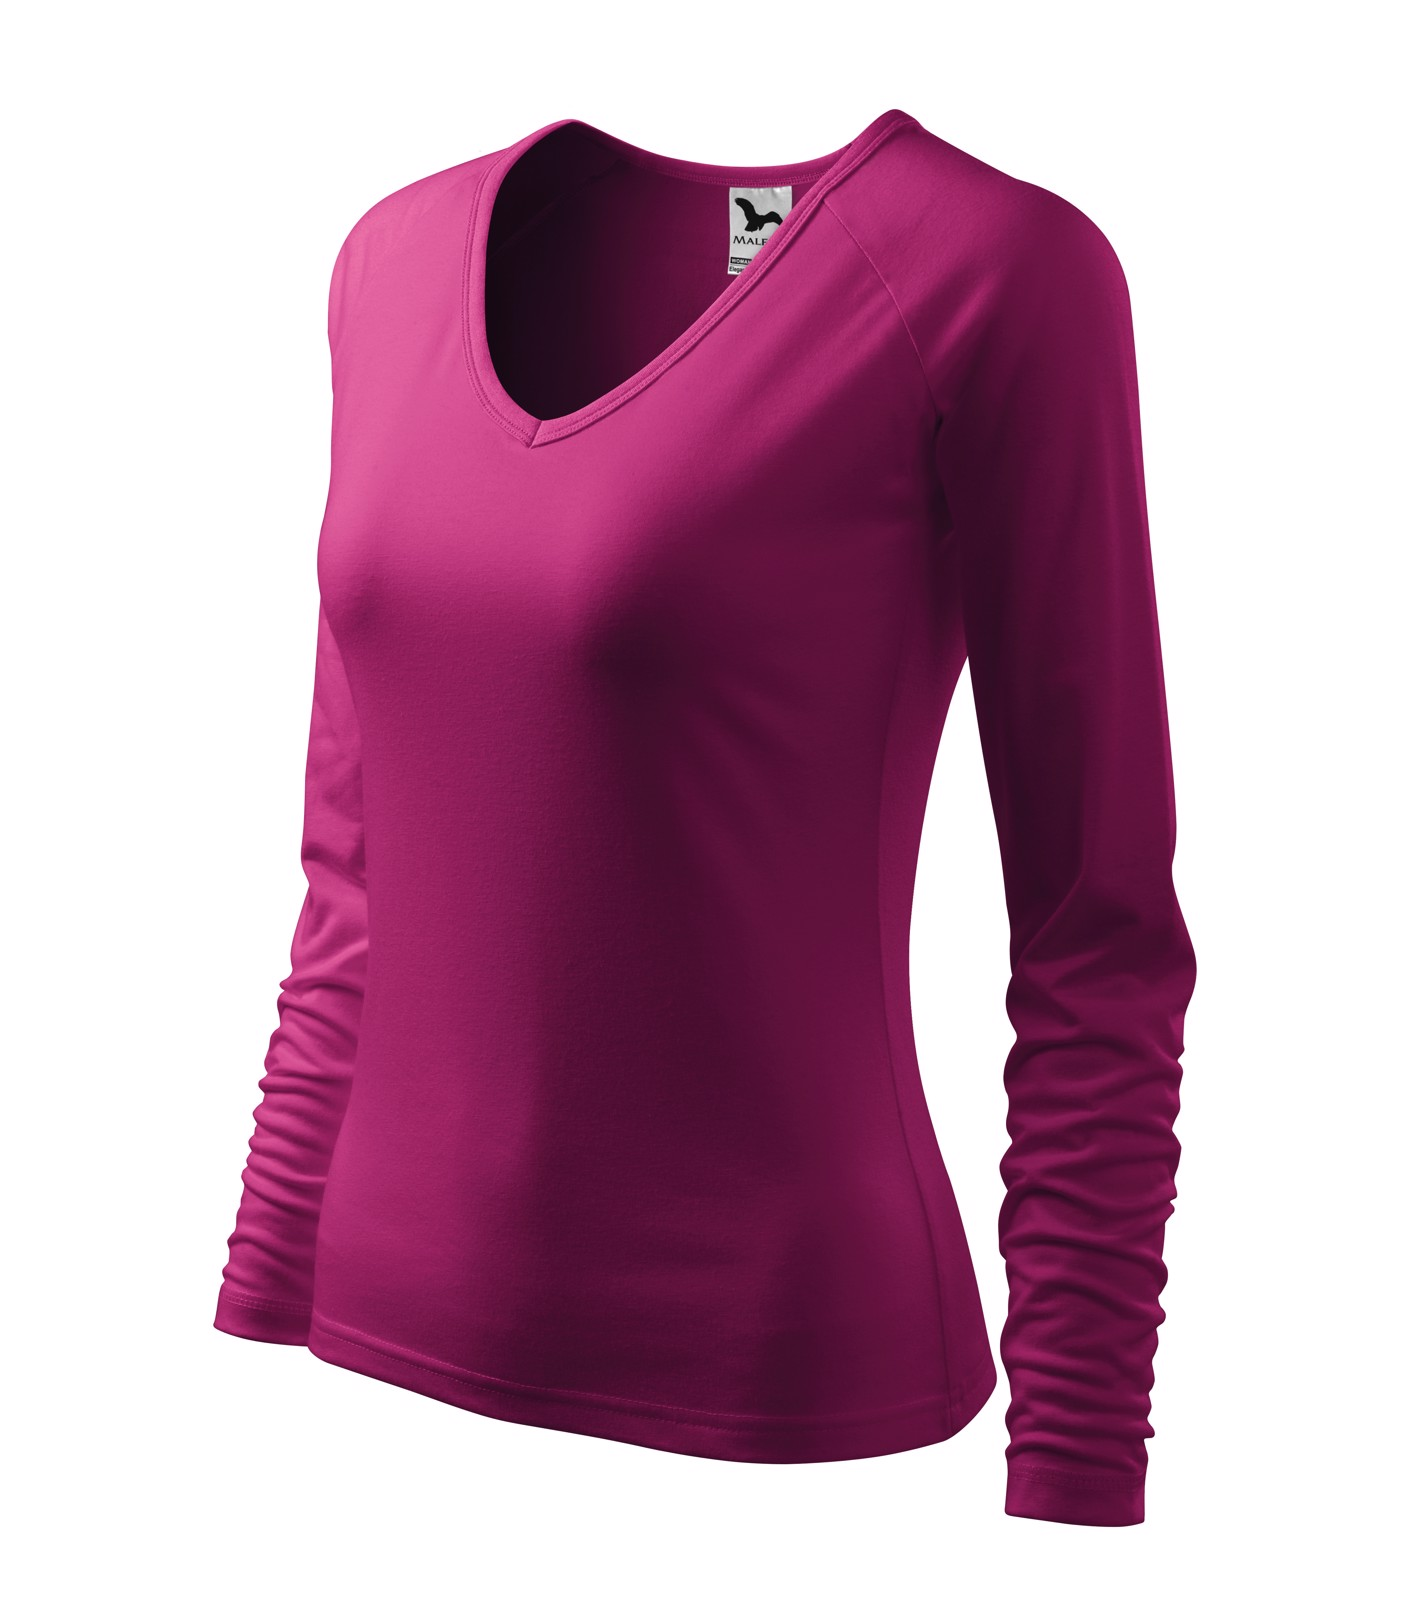 T-shirt women's Malfini Elegance - Rhododendron / L